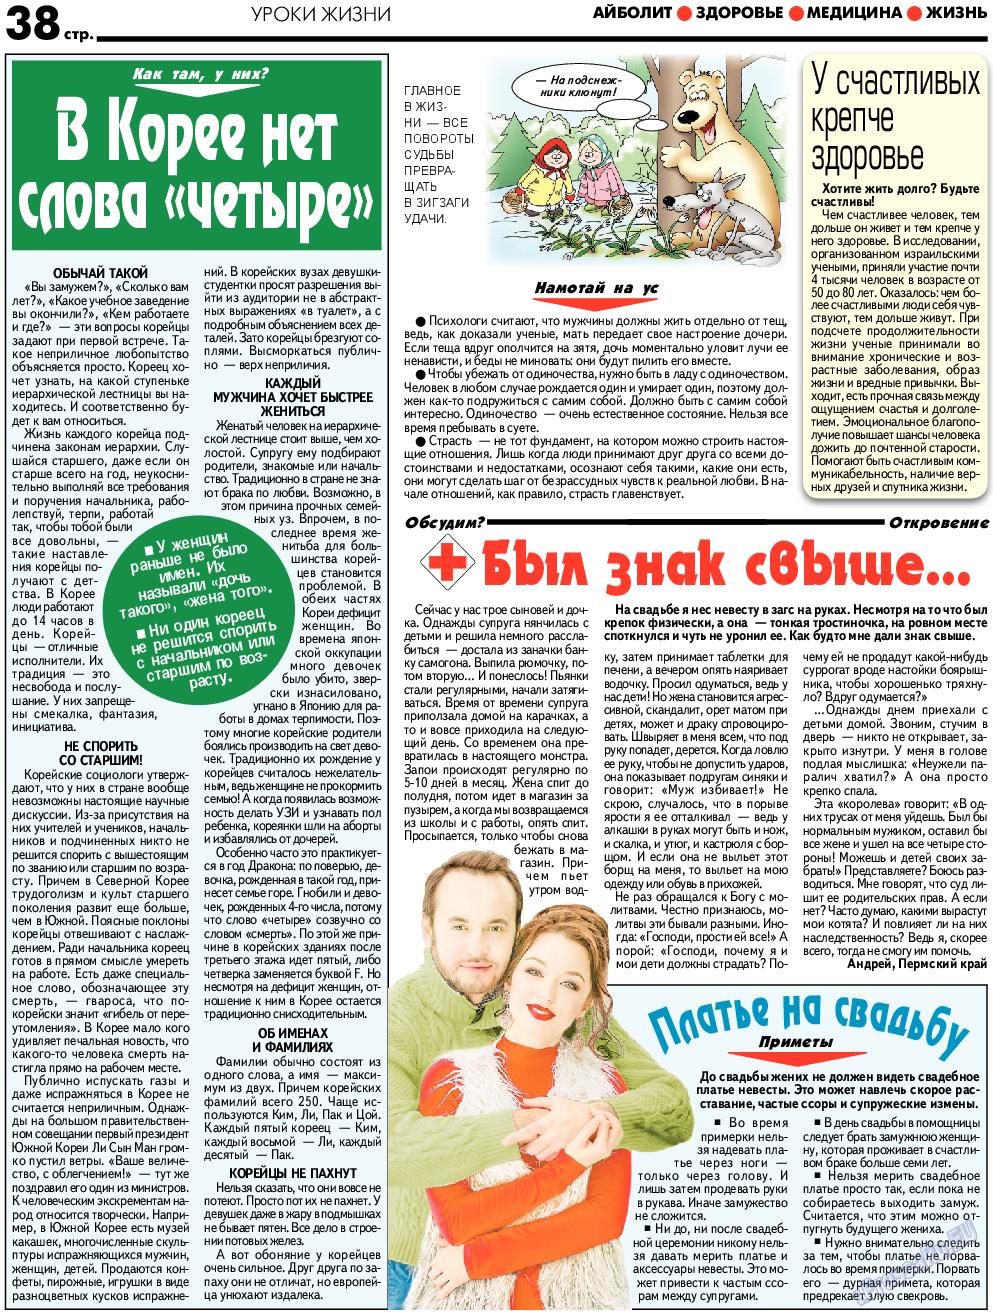 АйБолит (газета). 2018 год, номер 6, стр. 38